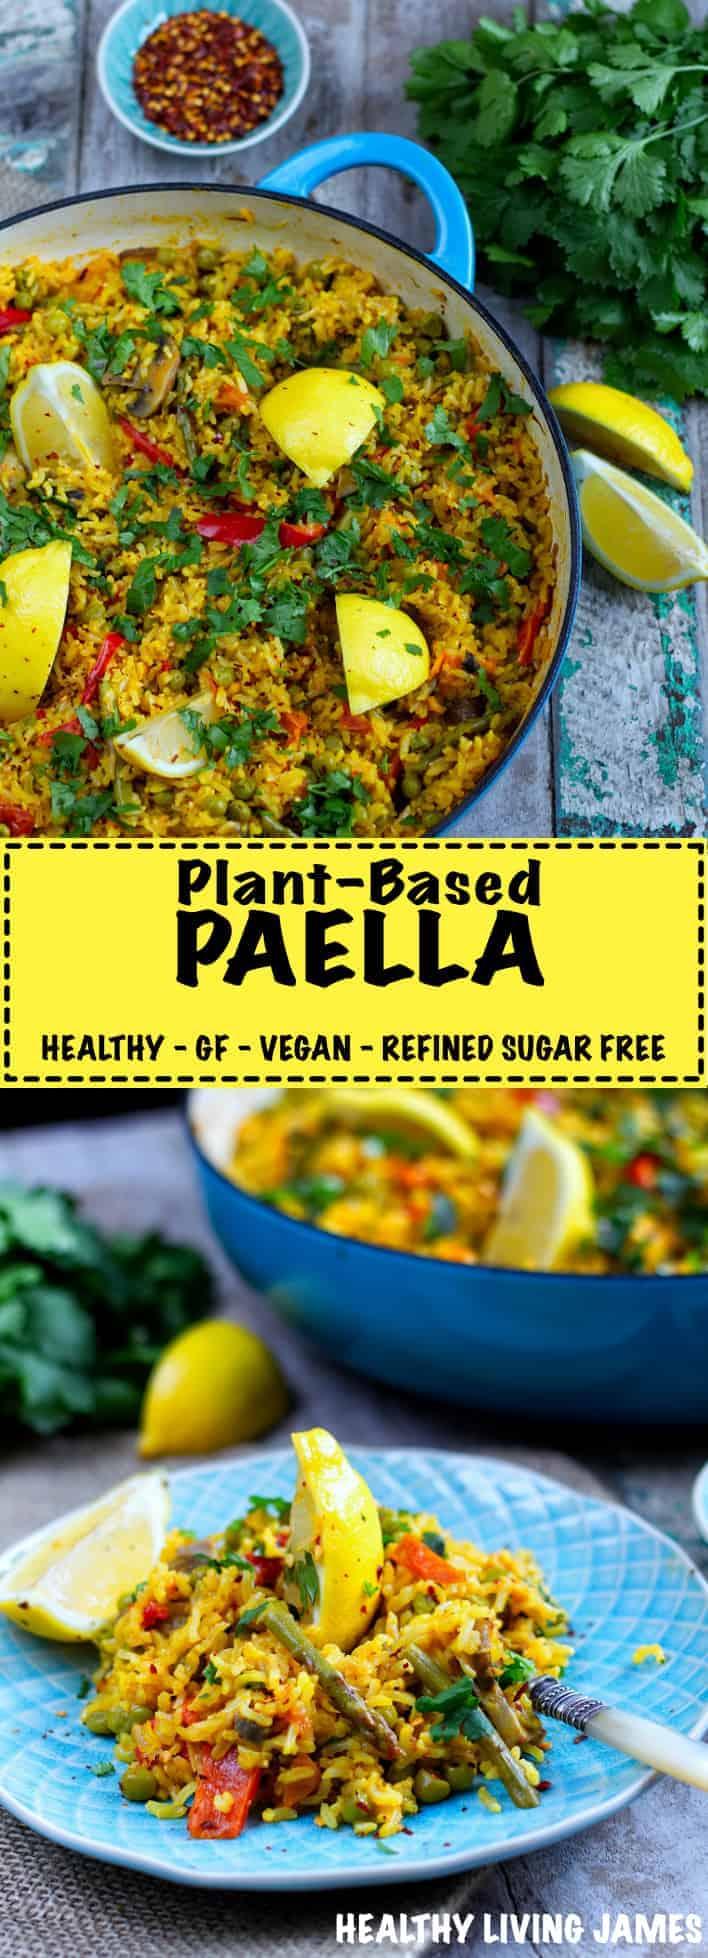 Plant-Based Paella Pinterest